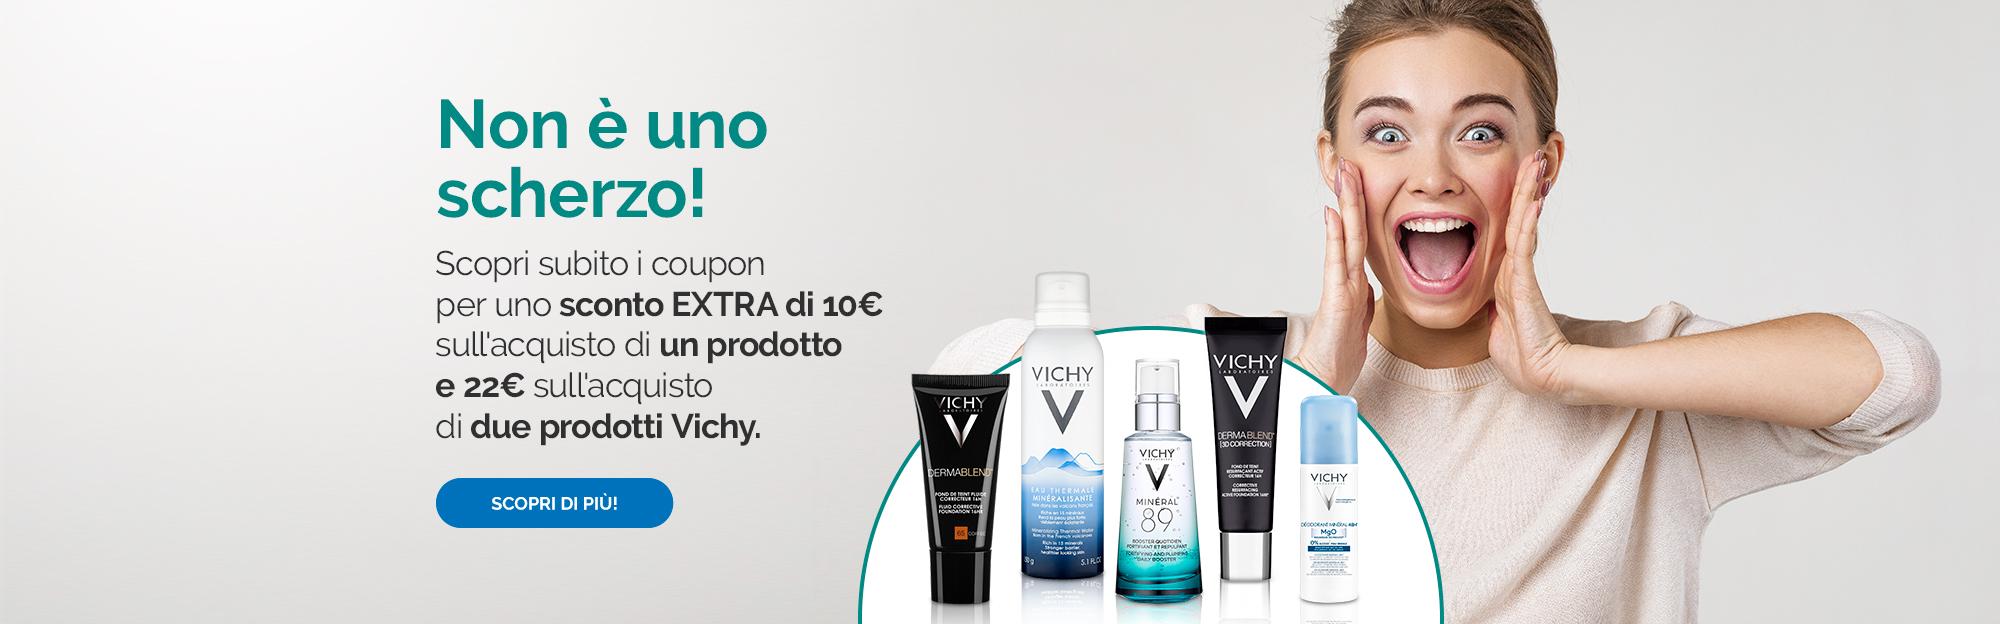 Slide-Promo-Vichy